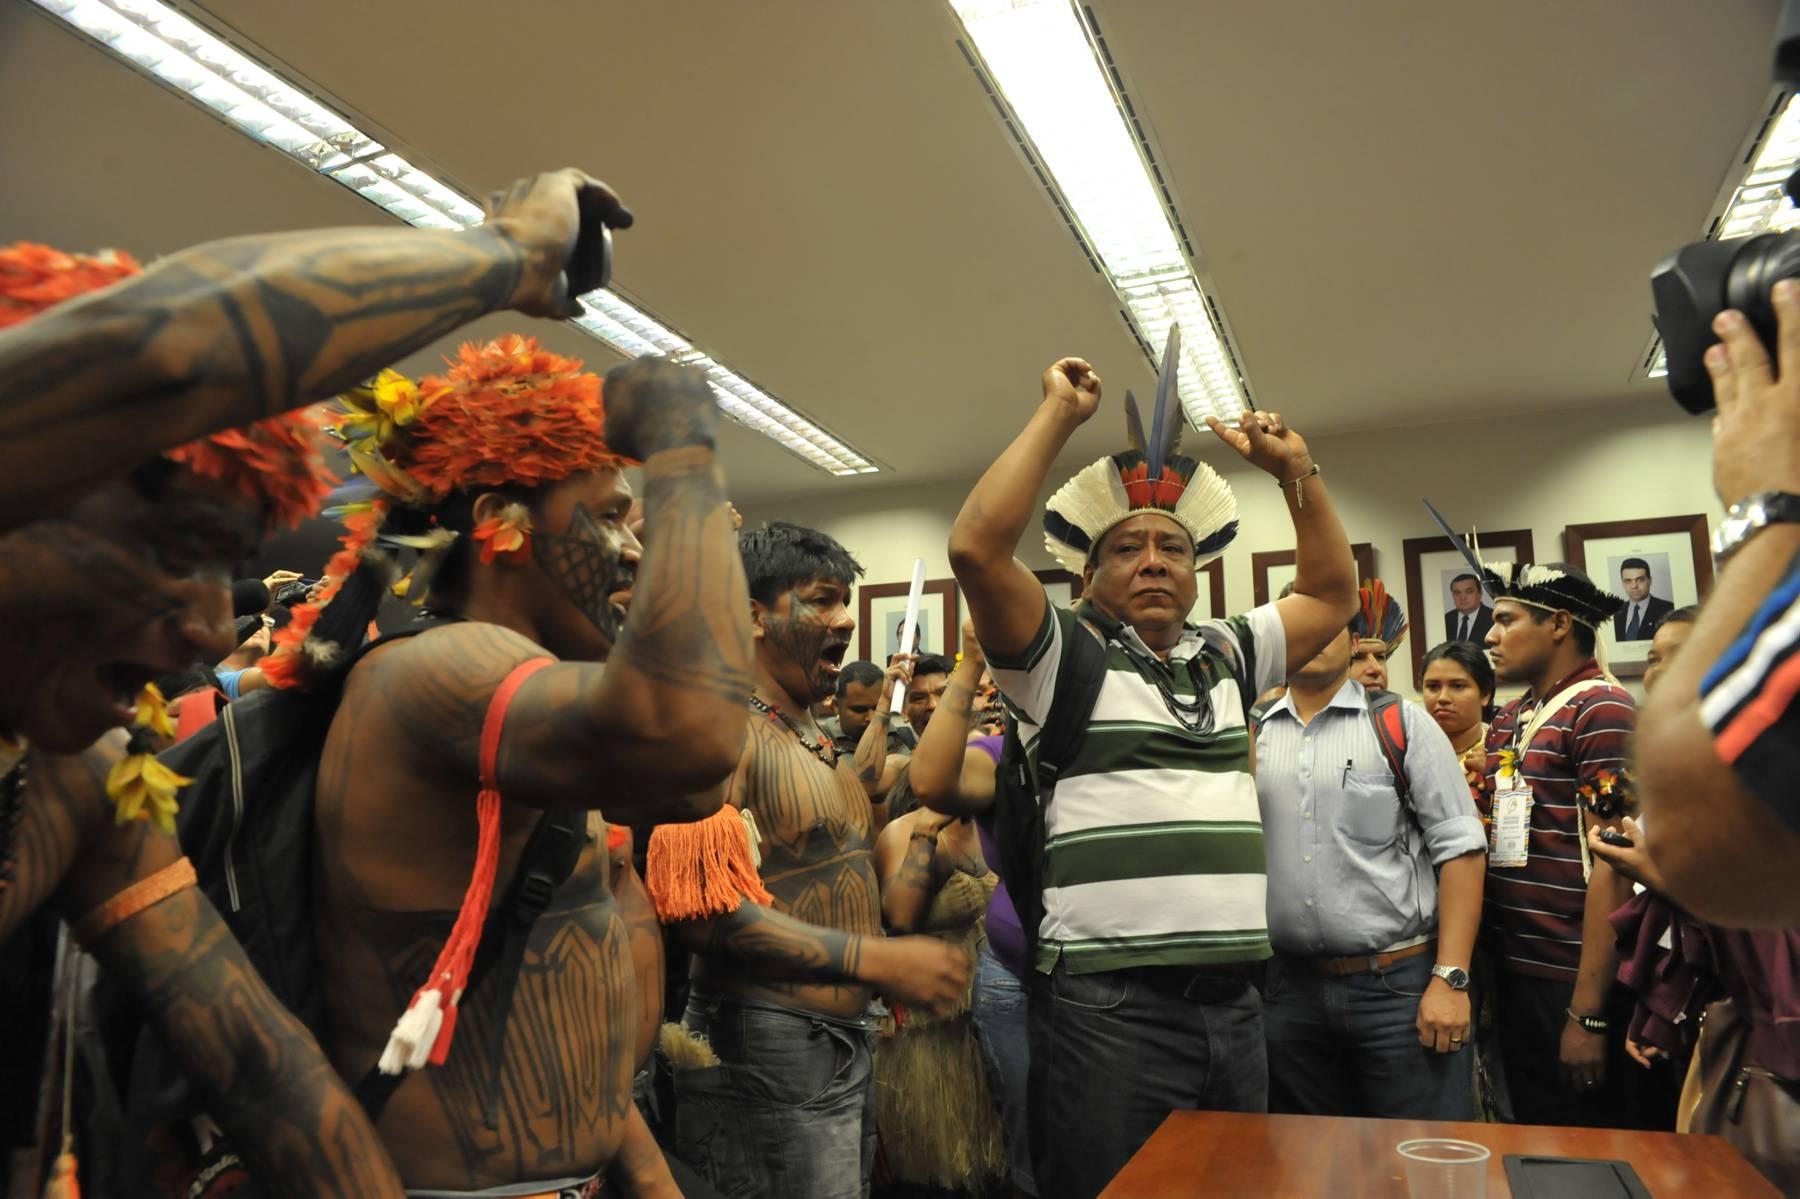 Índios Munduruku vão à Brasília contra usinas no Tapajós